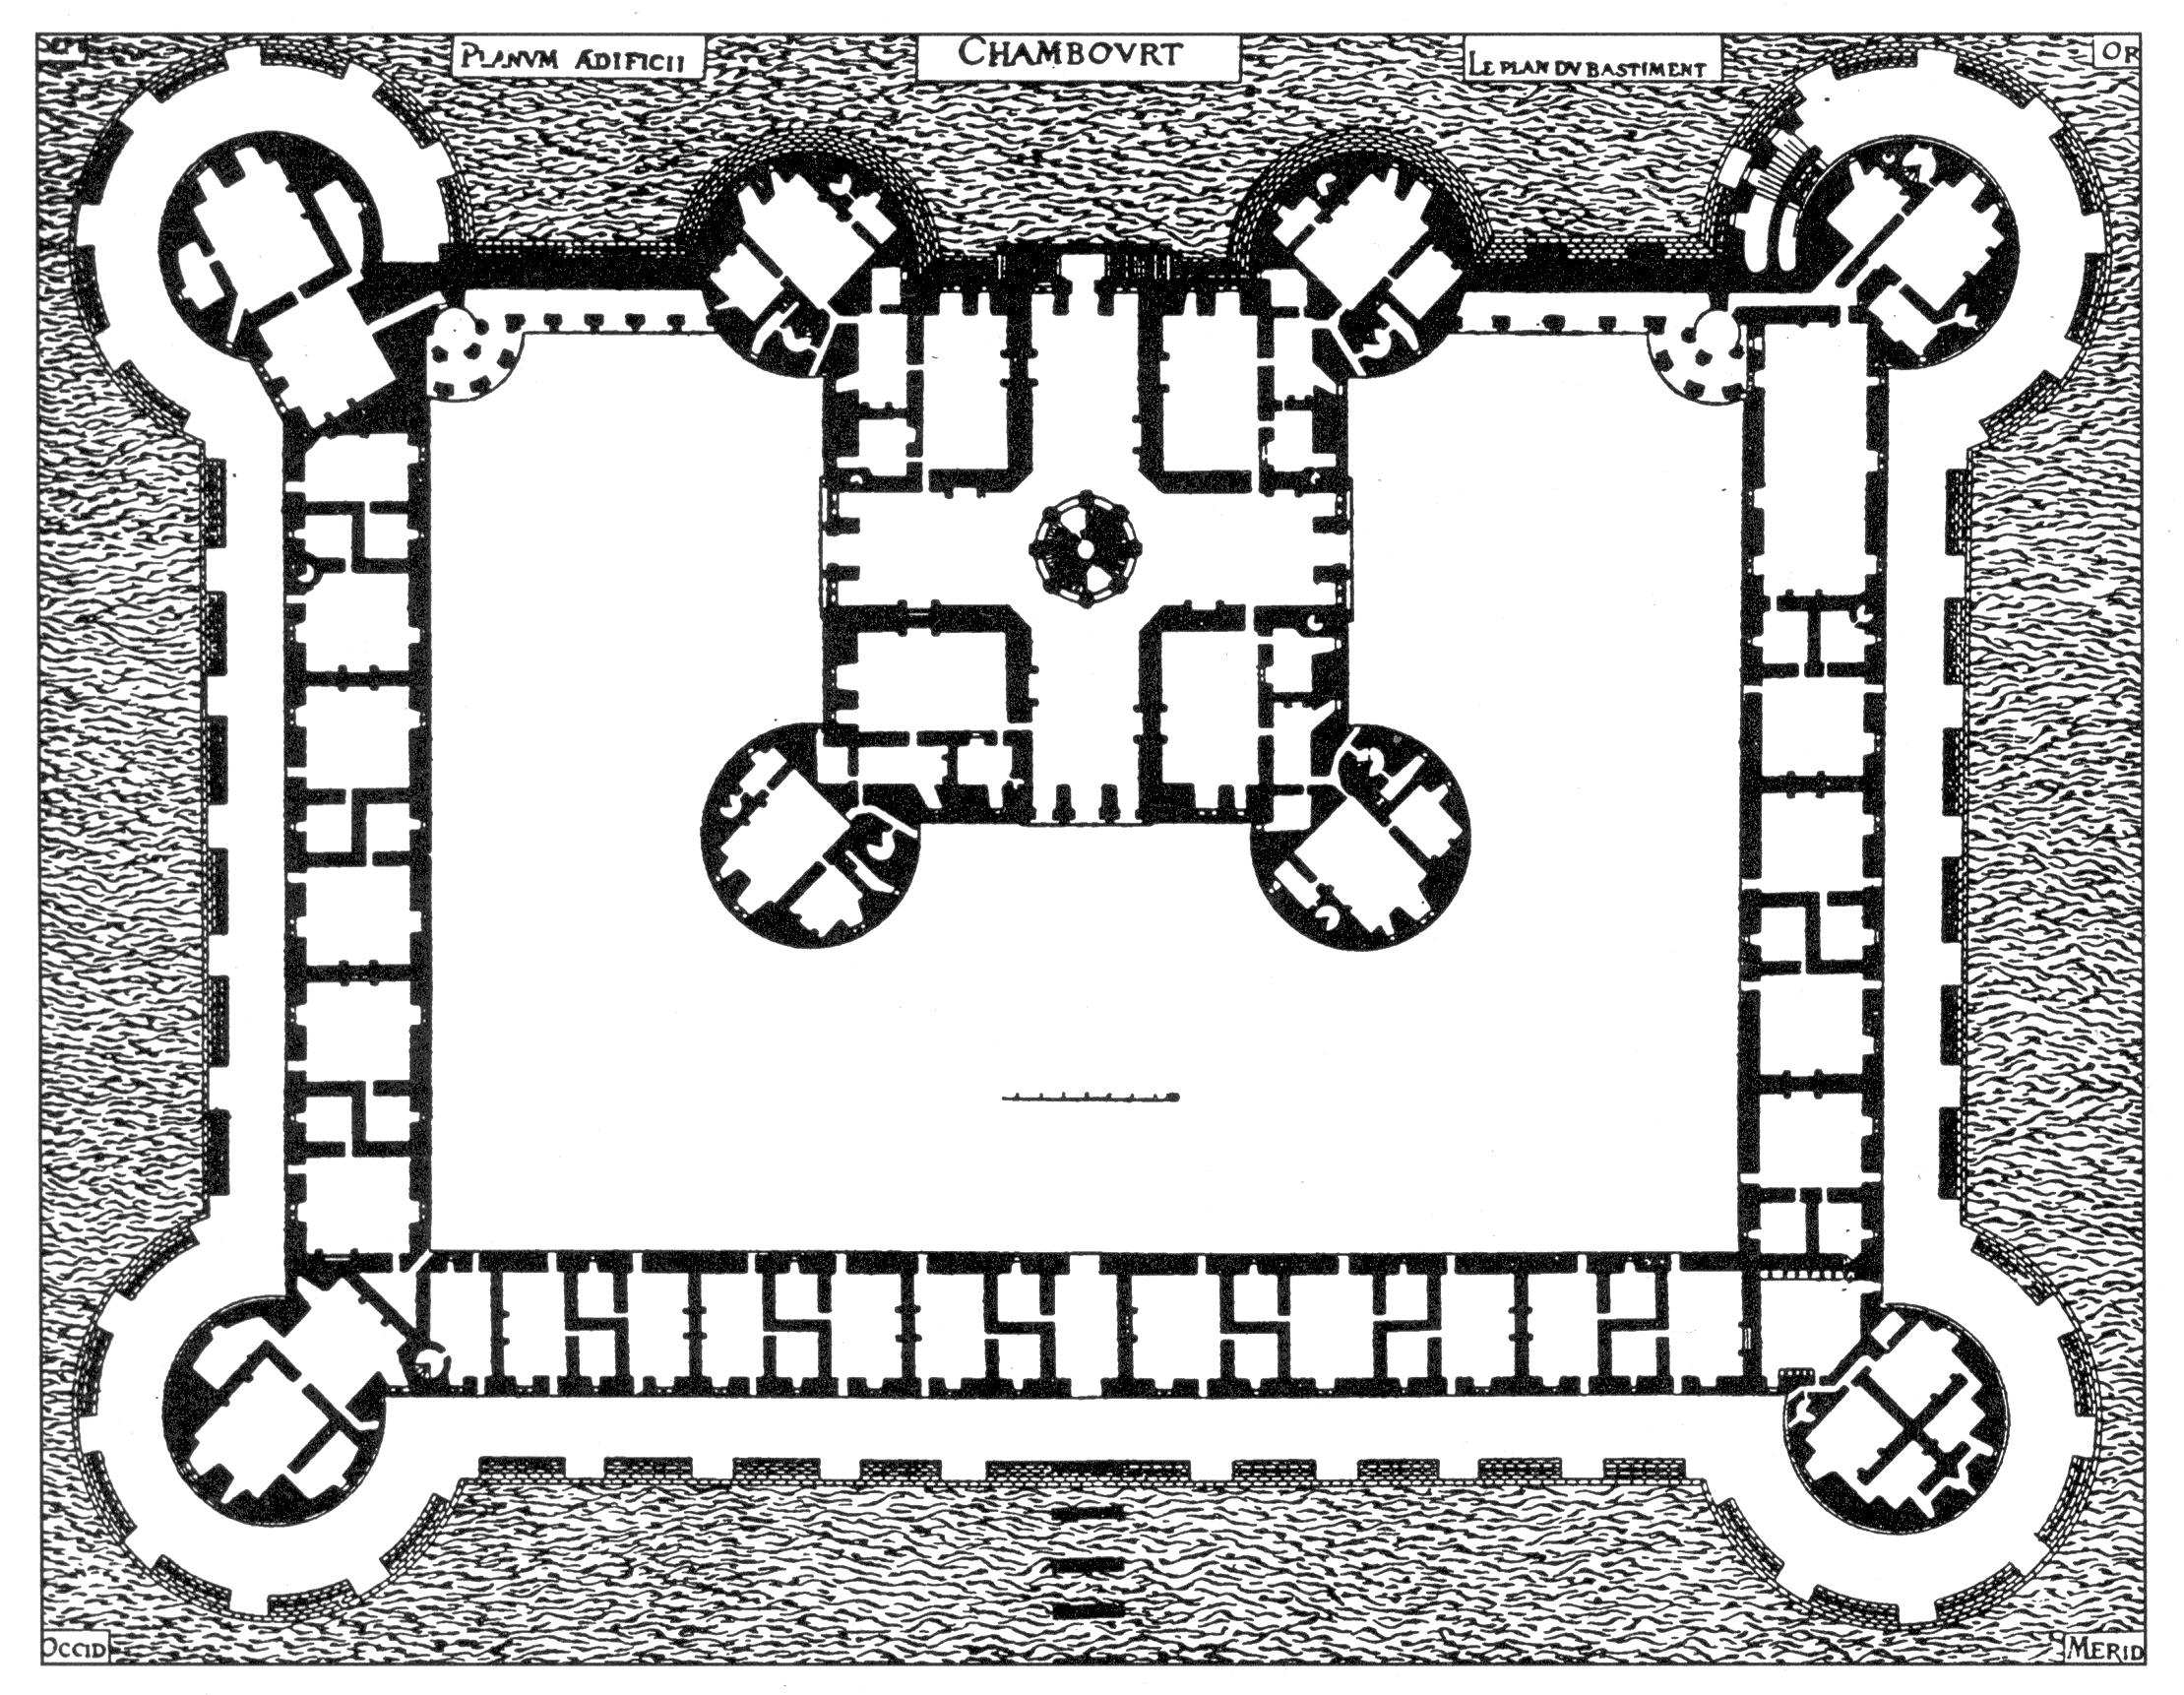 Grundriss von Chambord von Jaques Androhte du Cerceau